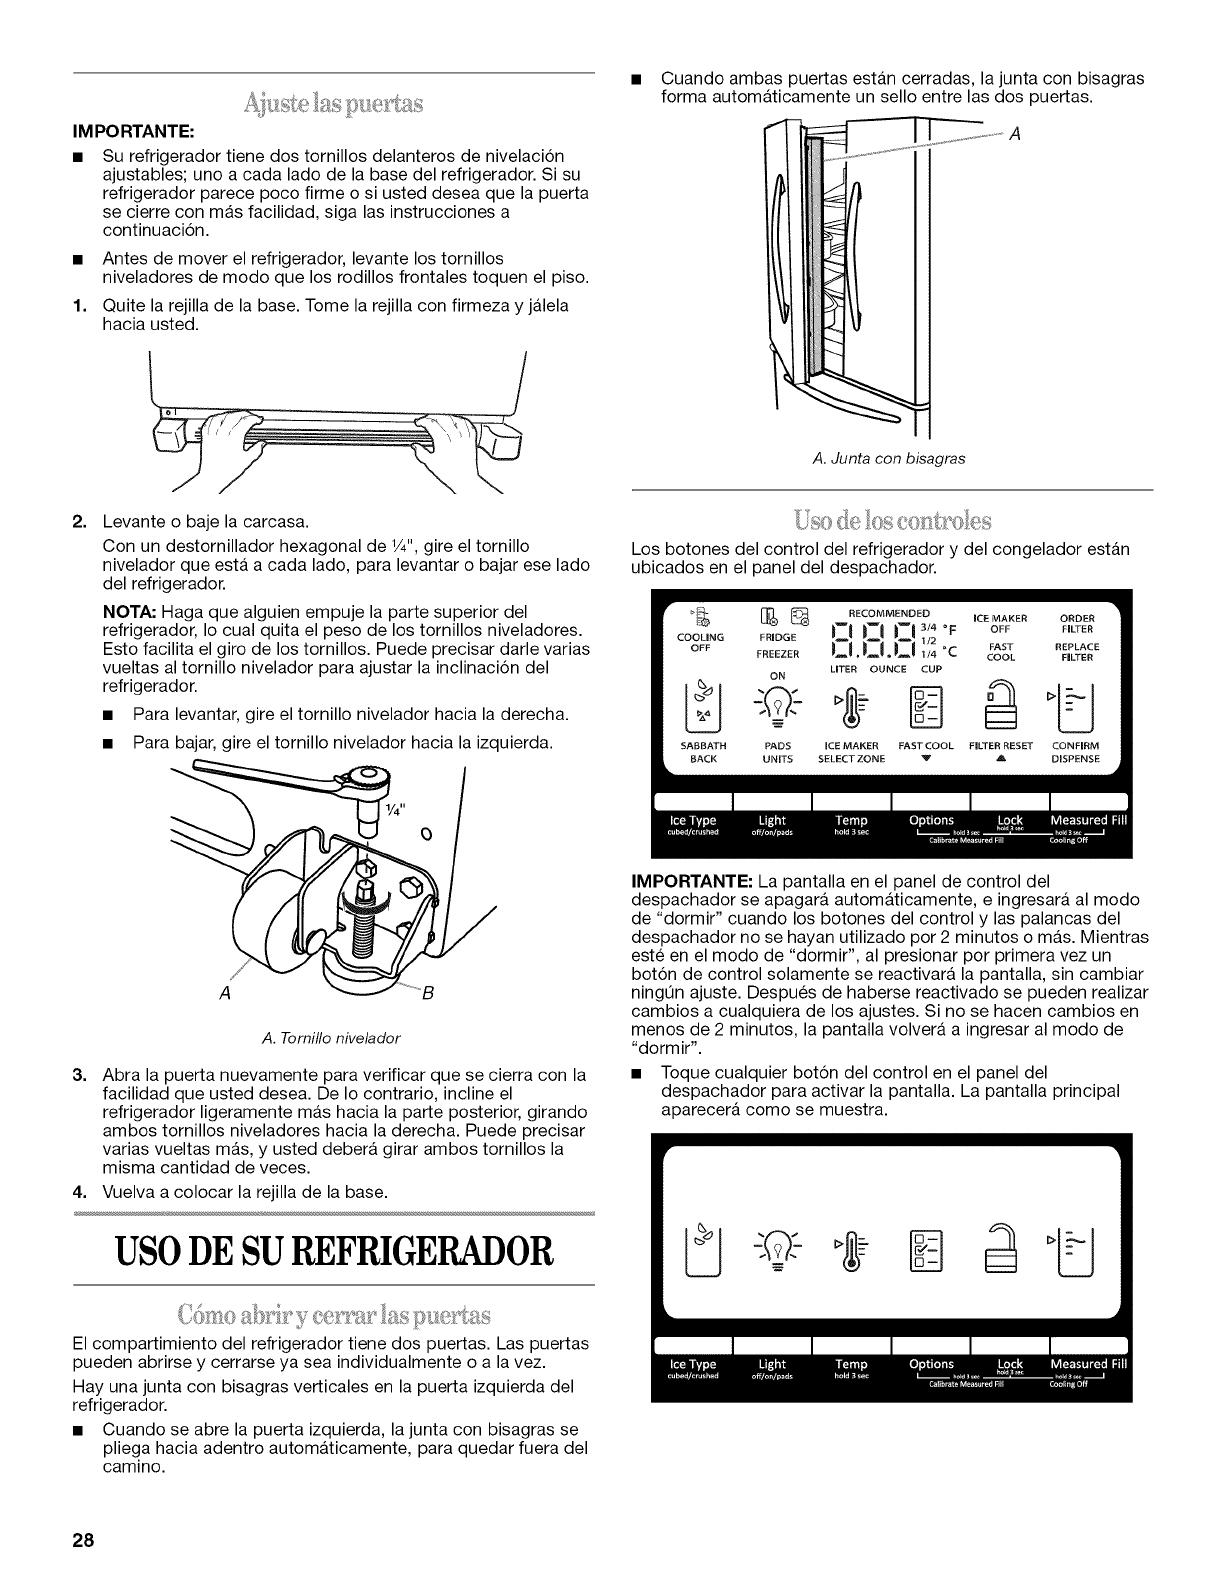 Whirlpool GZ25FSRXYY0 1112387L User Manual REFRIGERATOR